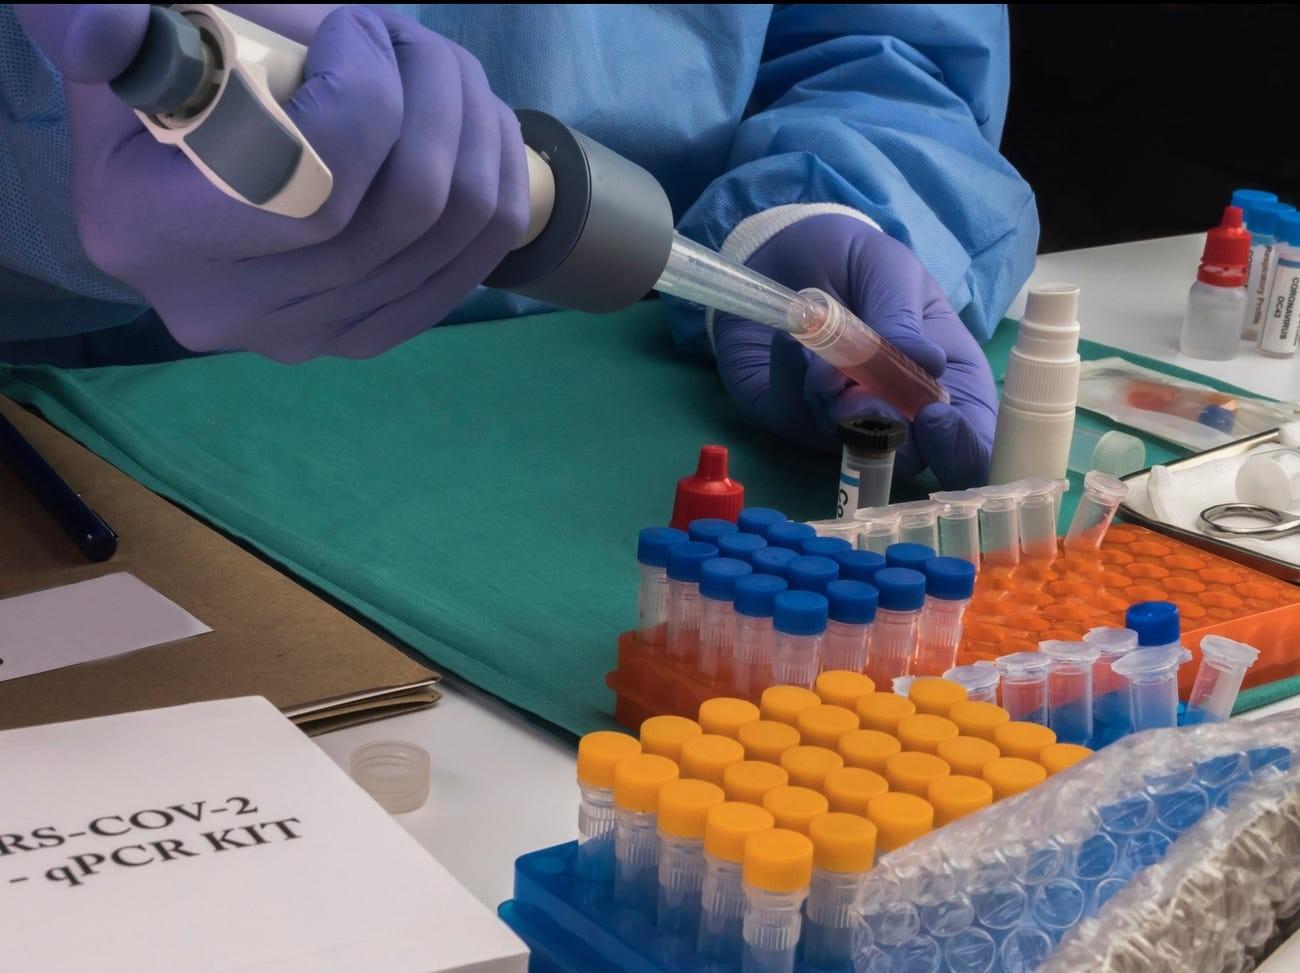 A cheap steroid dramatically reduced coronavirus deaths in a 'major breakthrough' trial.